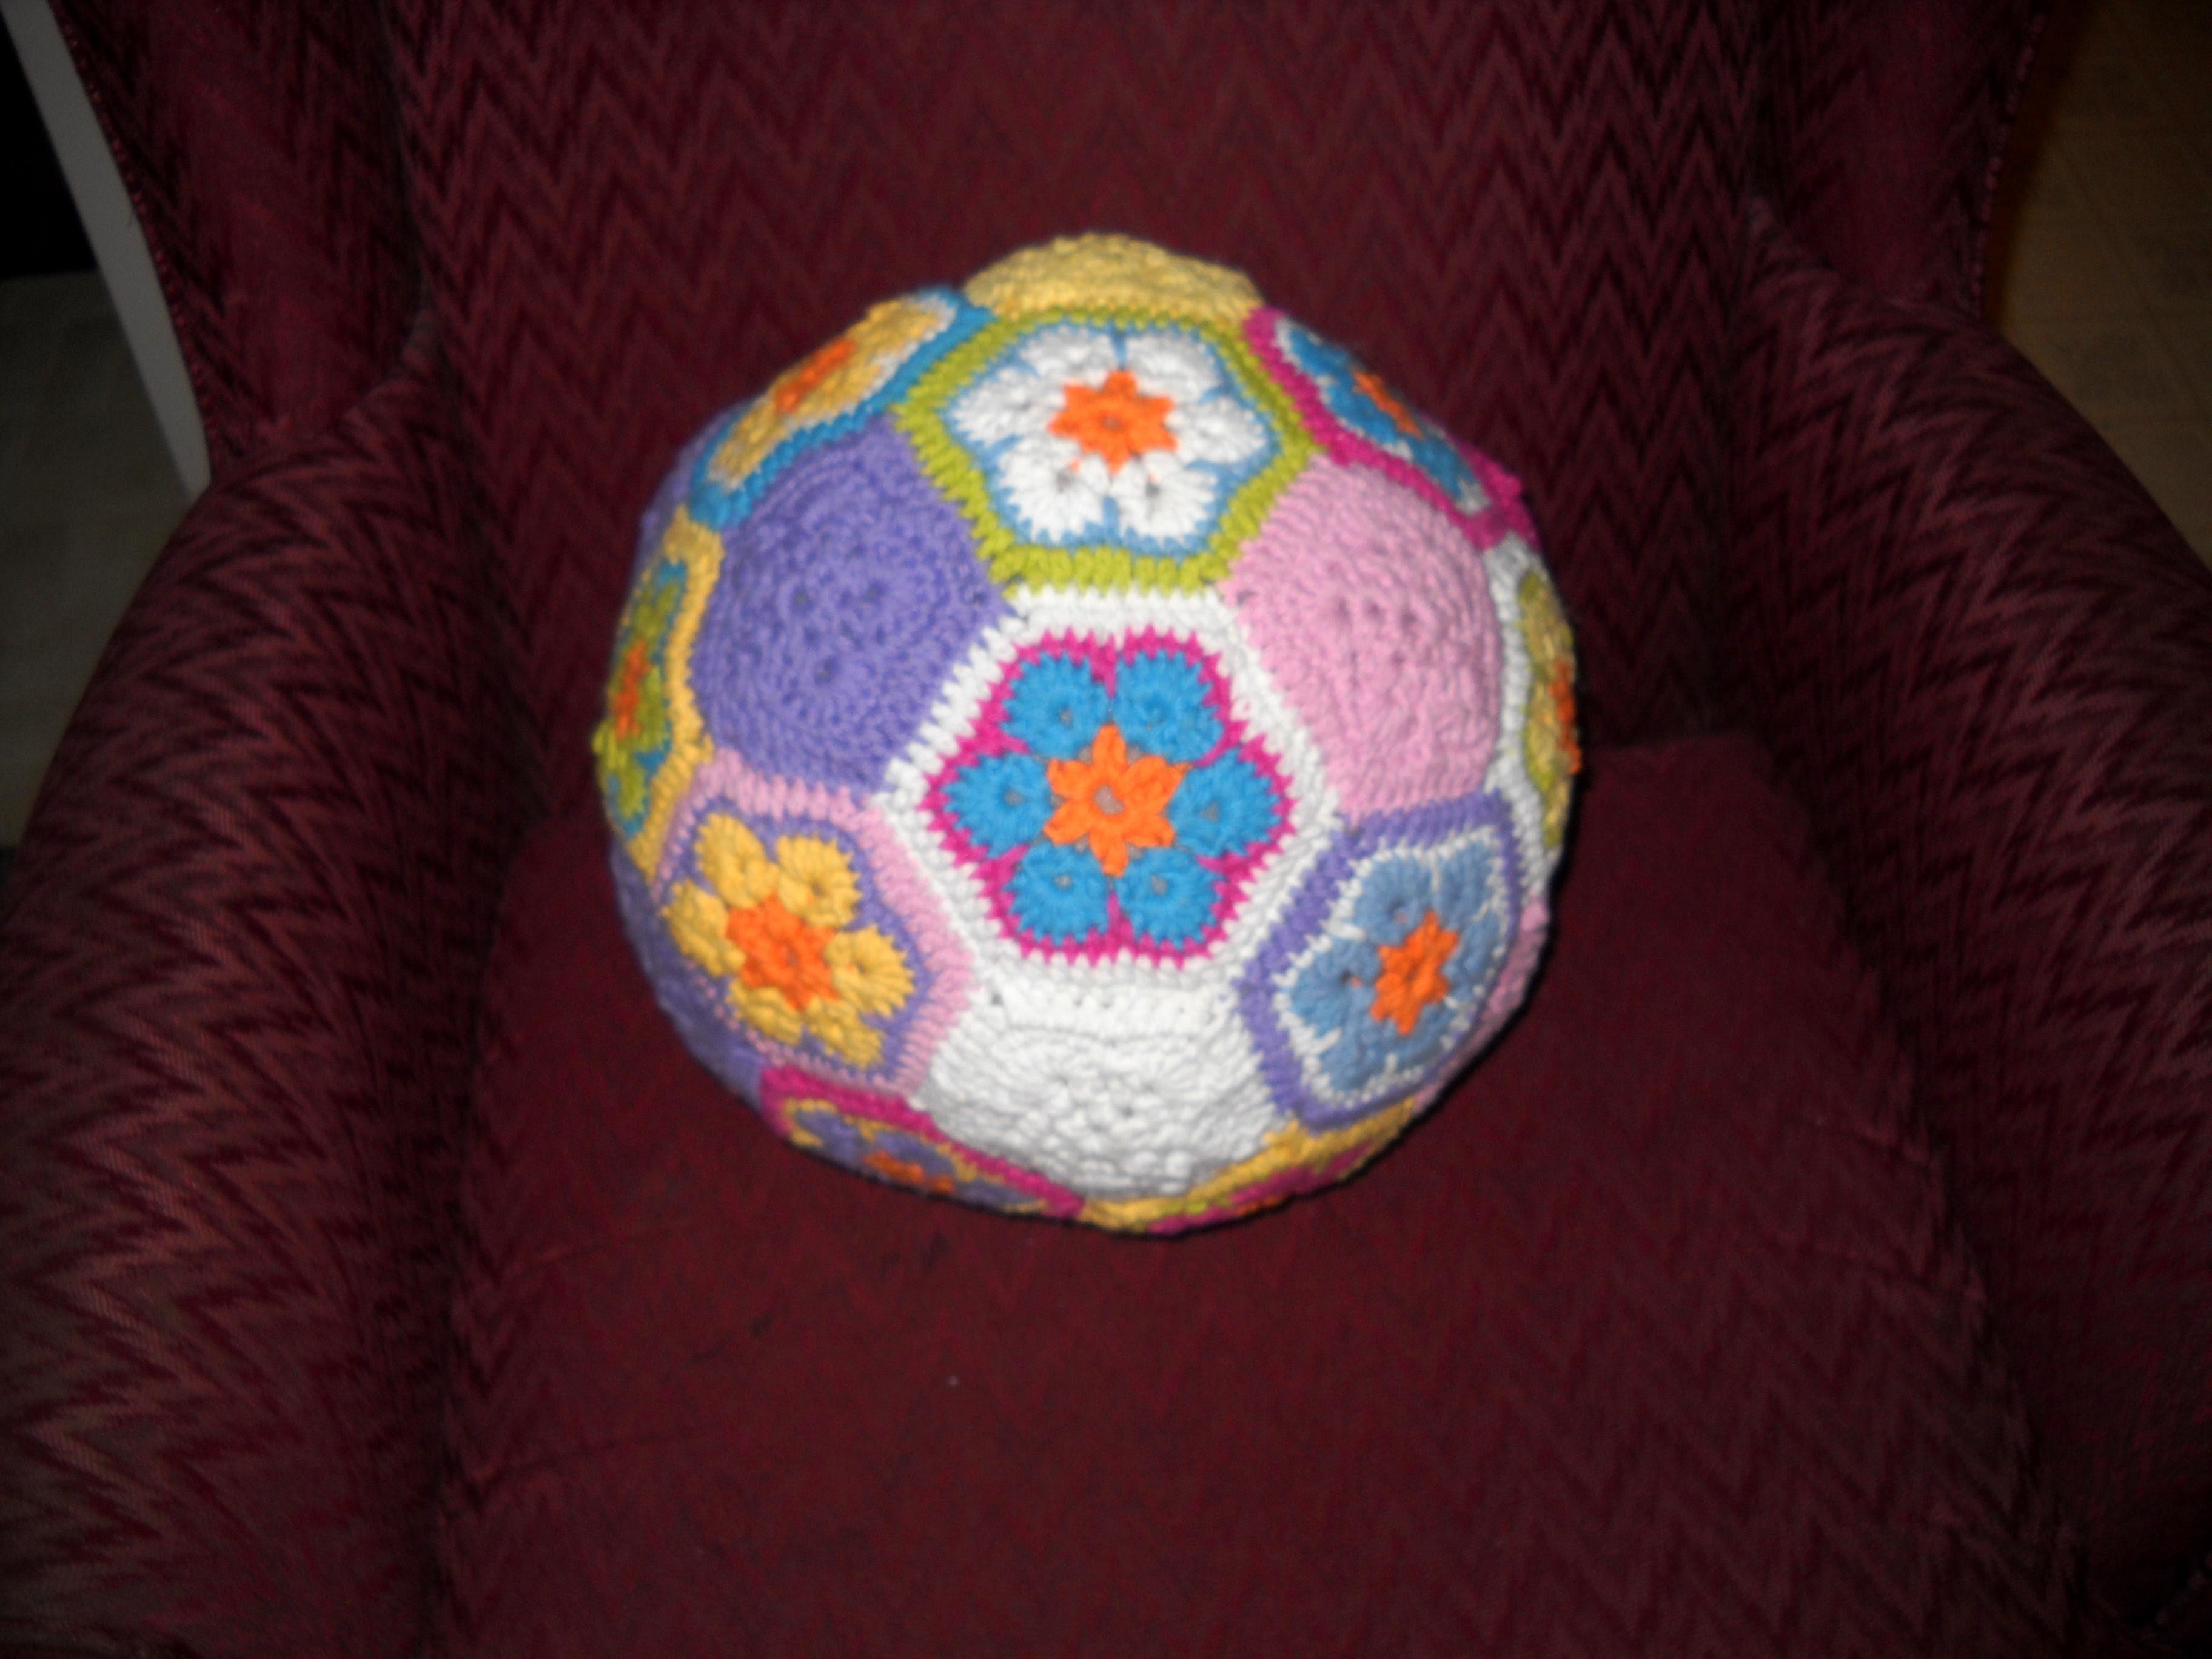 African Flower Soccer Ball1